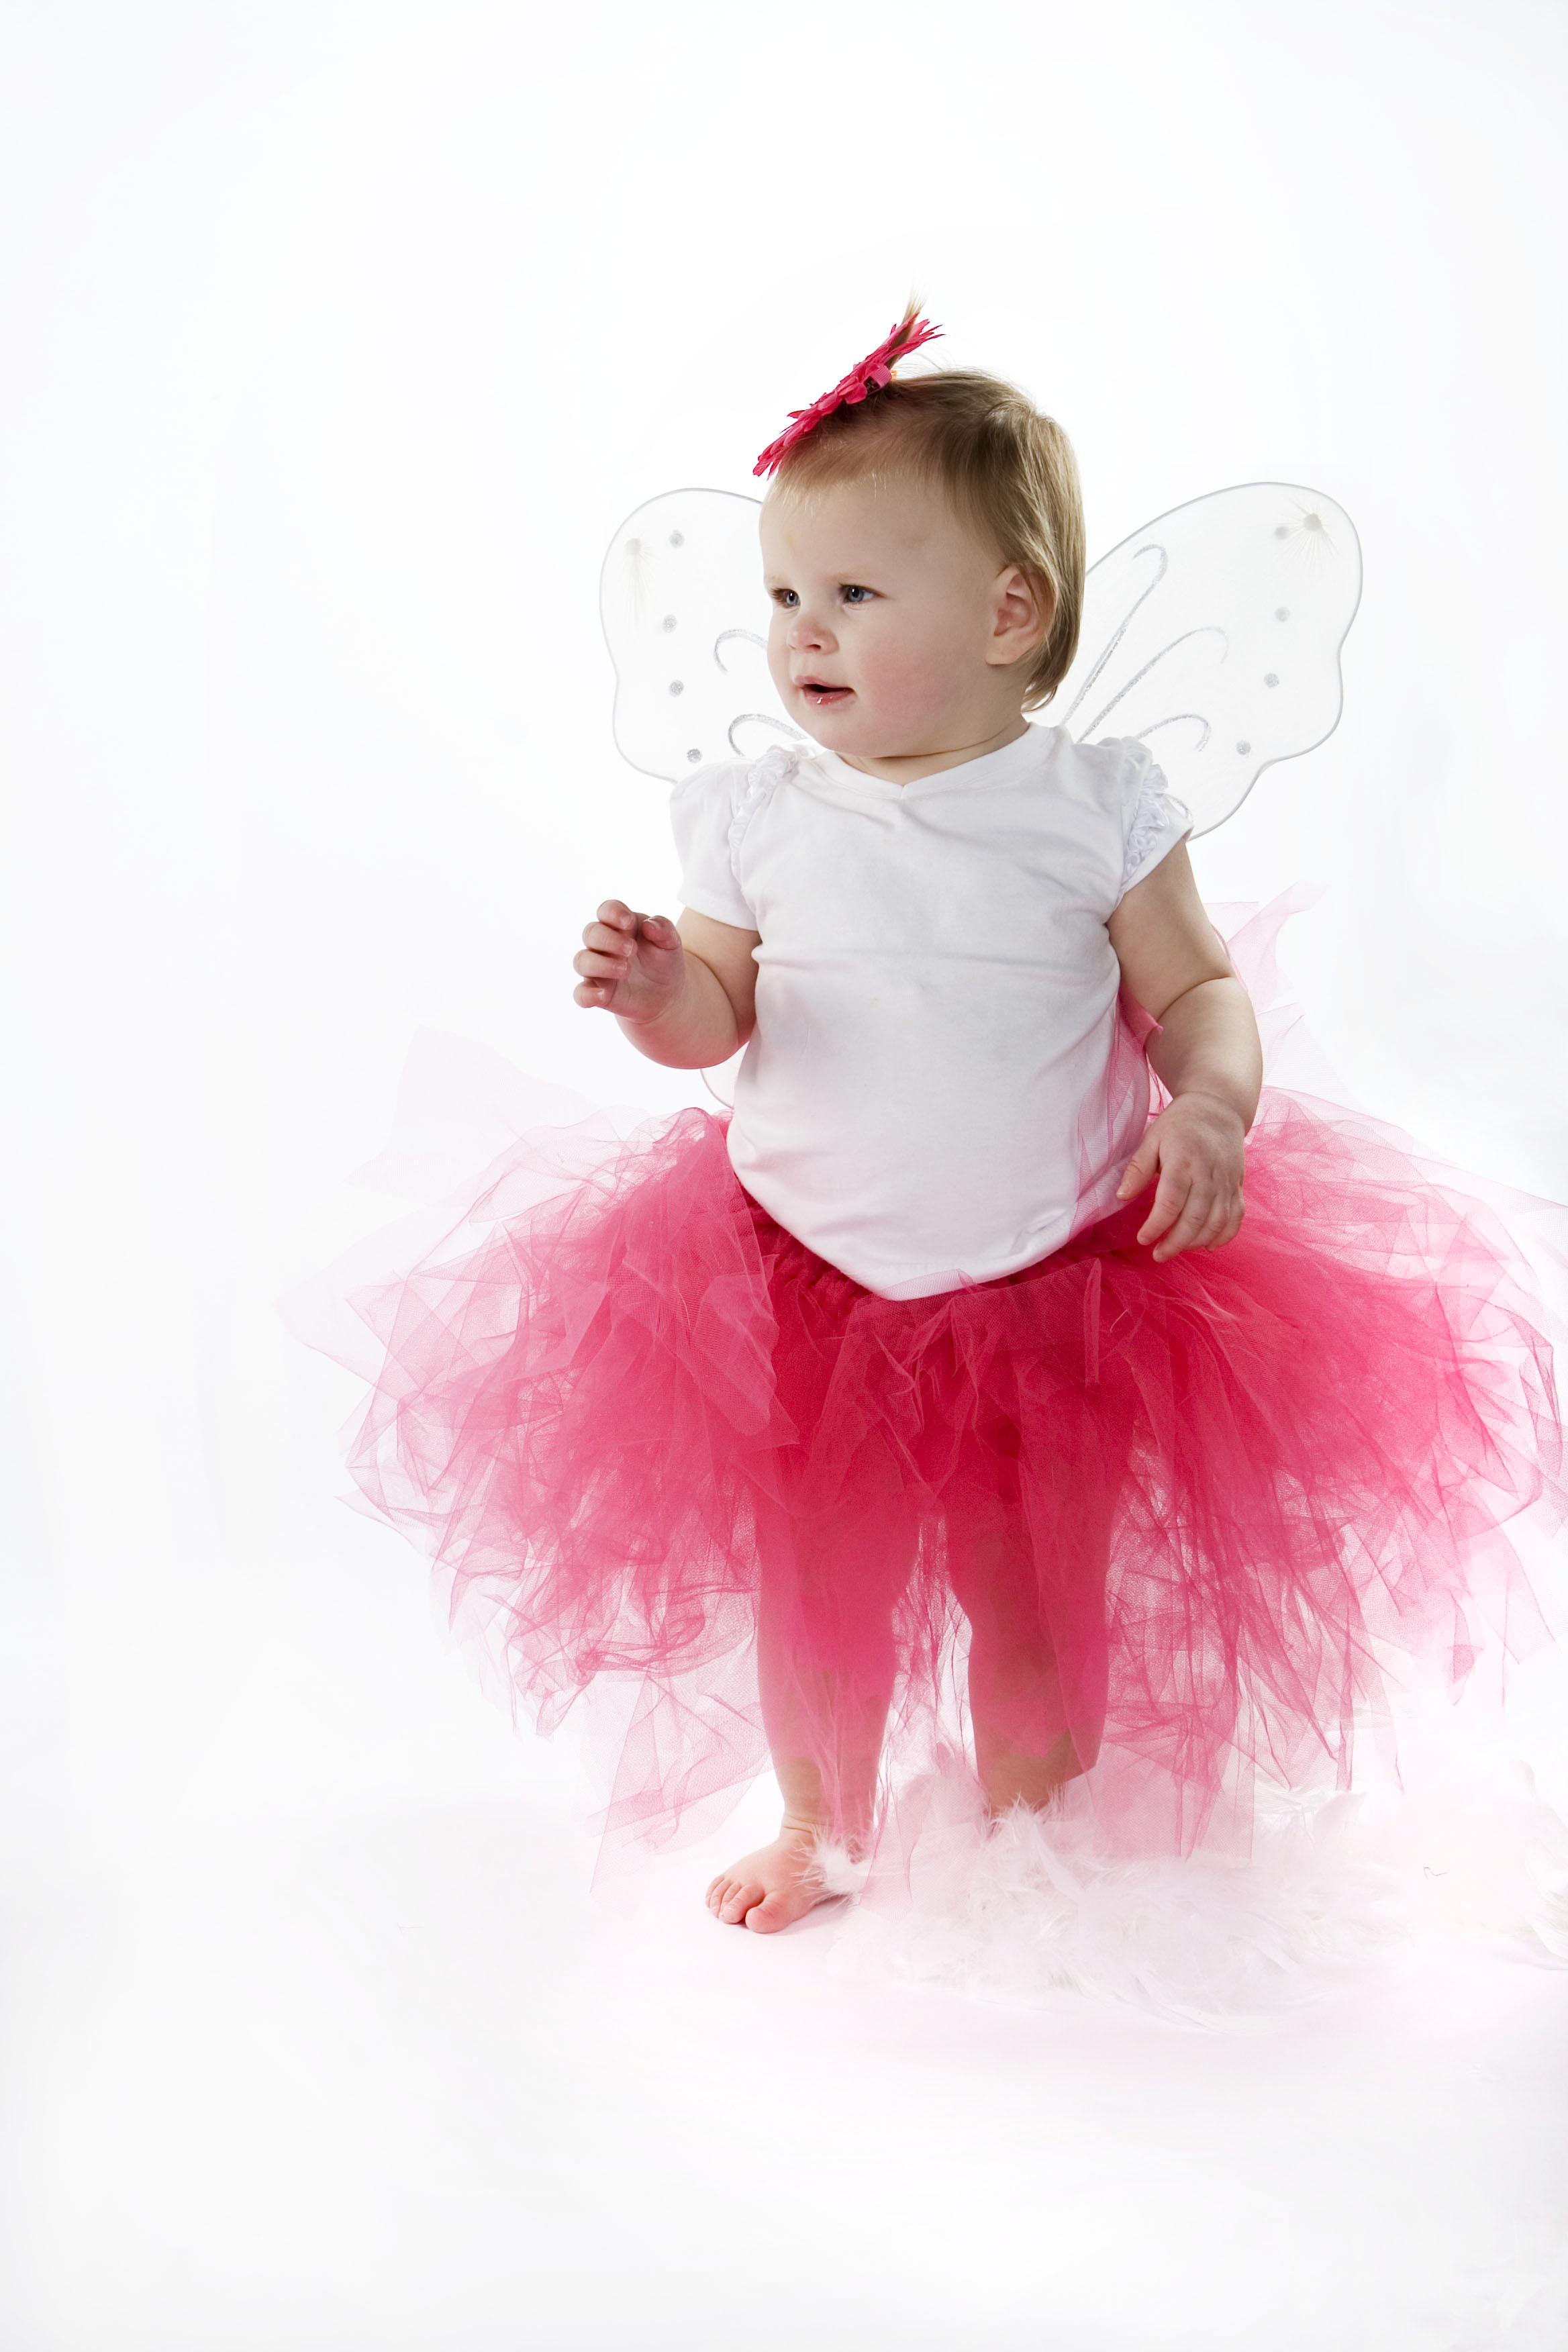 babygirlphotographylansingmichiganphotographersportraitstudiookemosmichigan.jpg